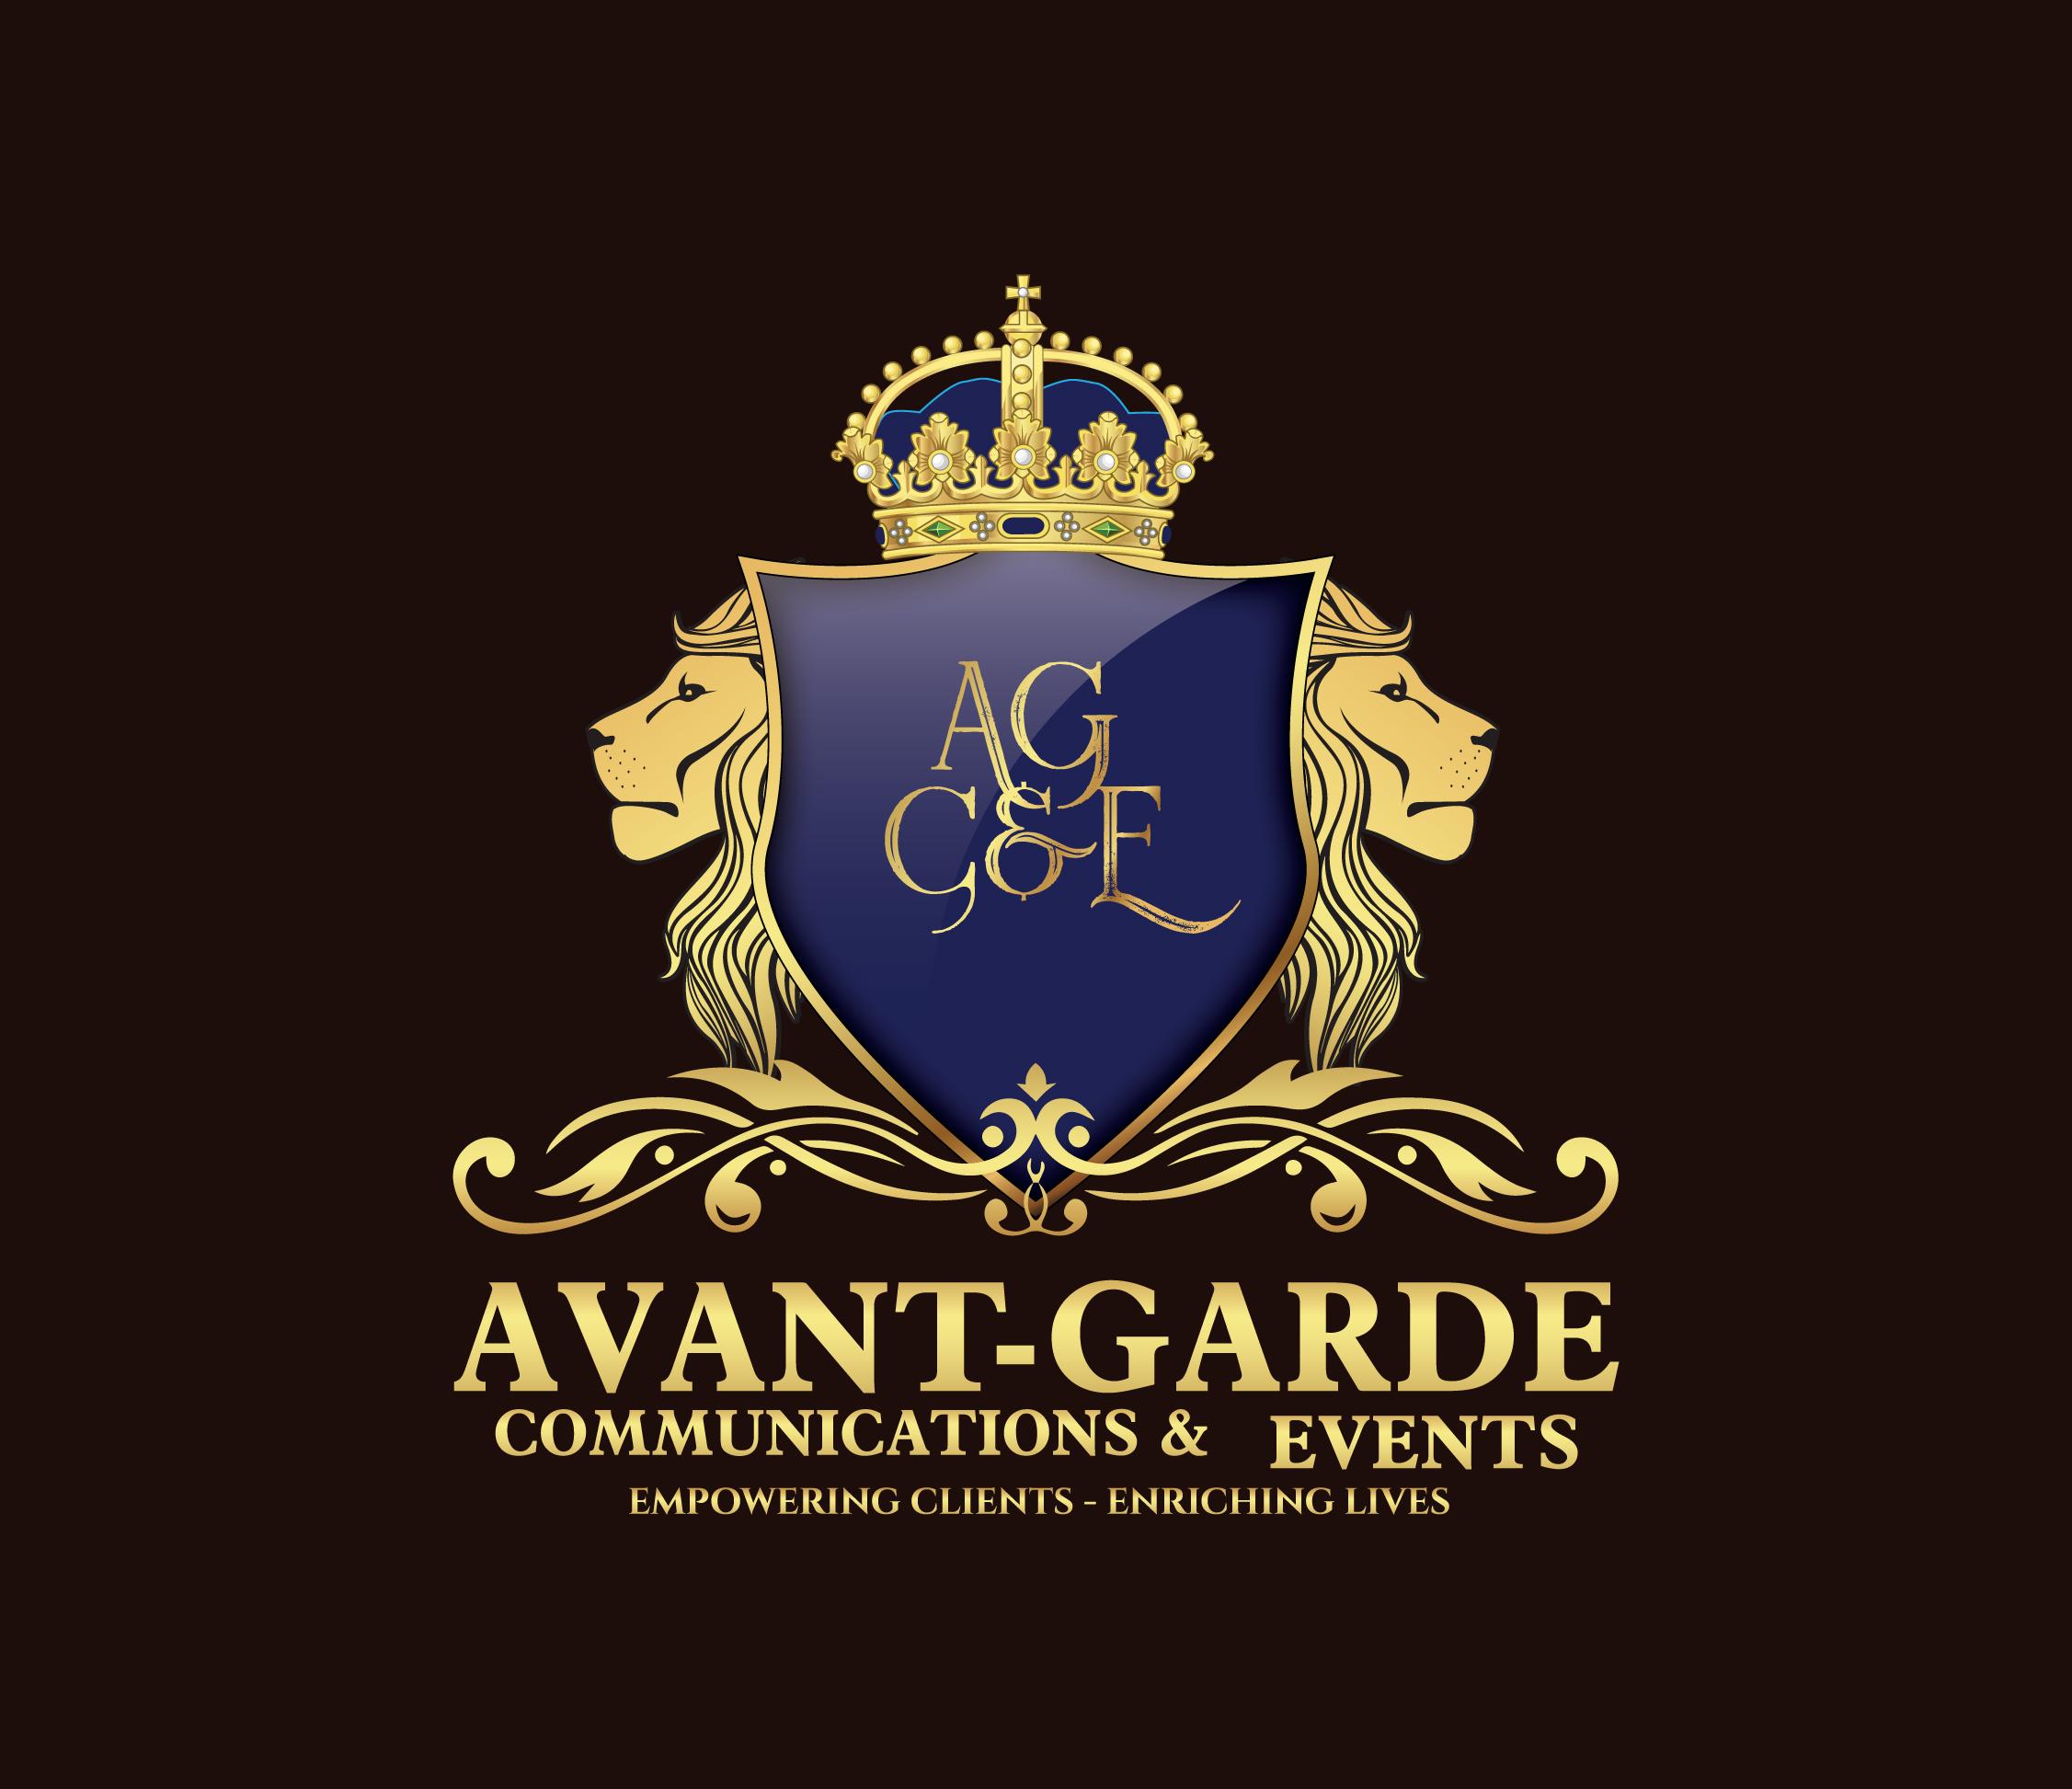 Avant-Garde Communications & Events